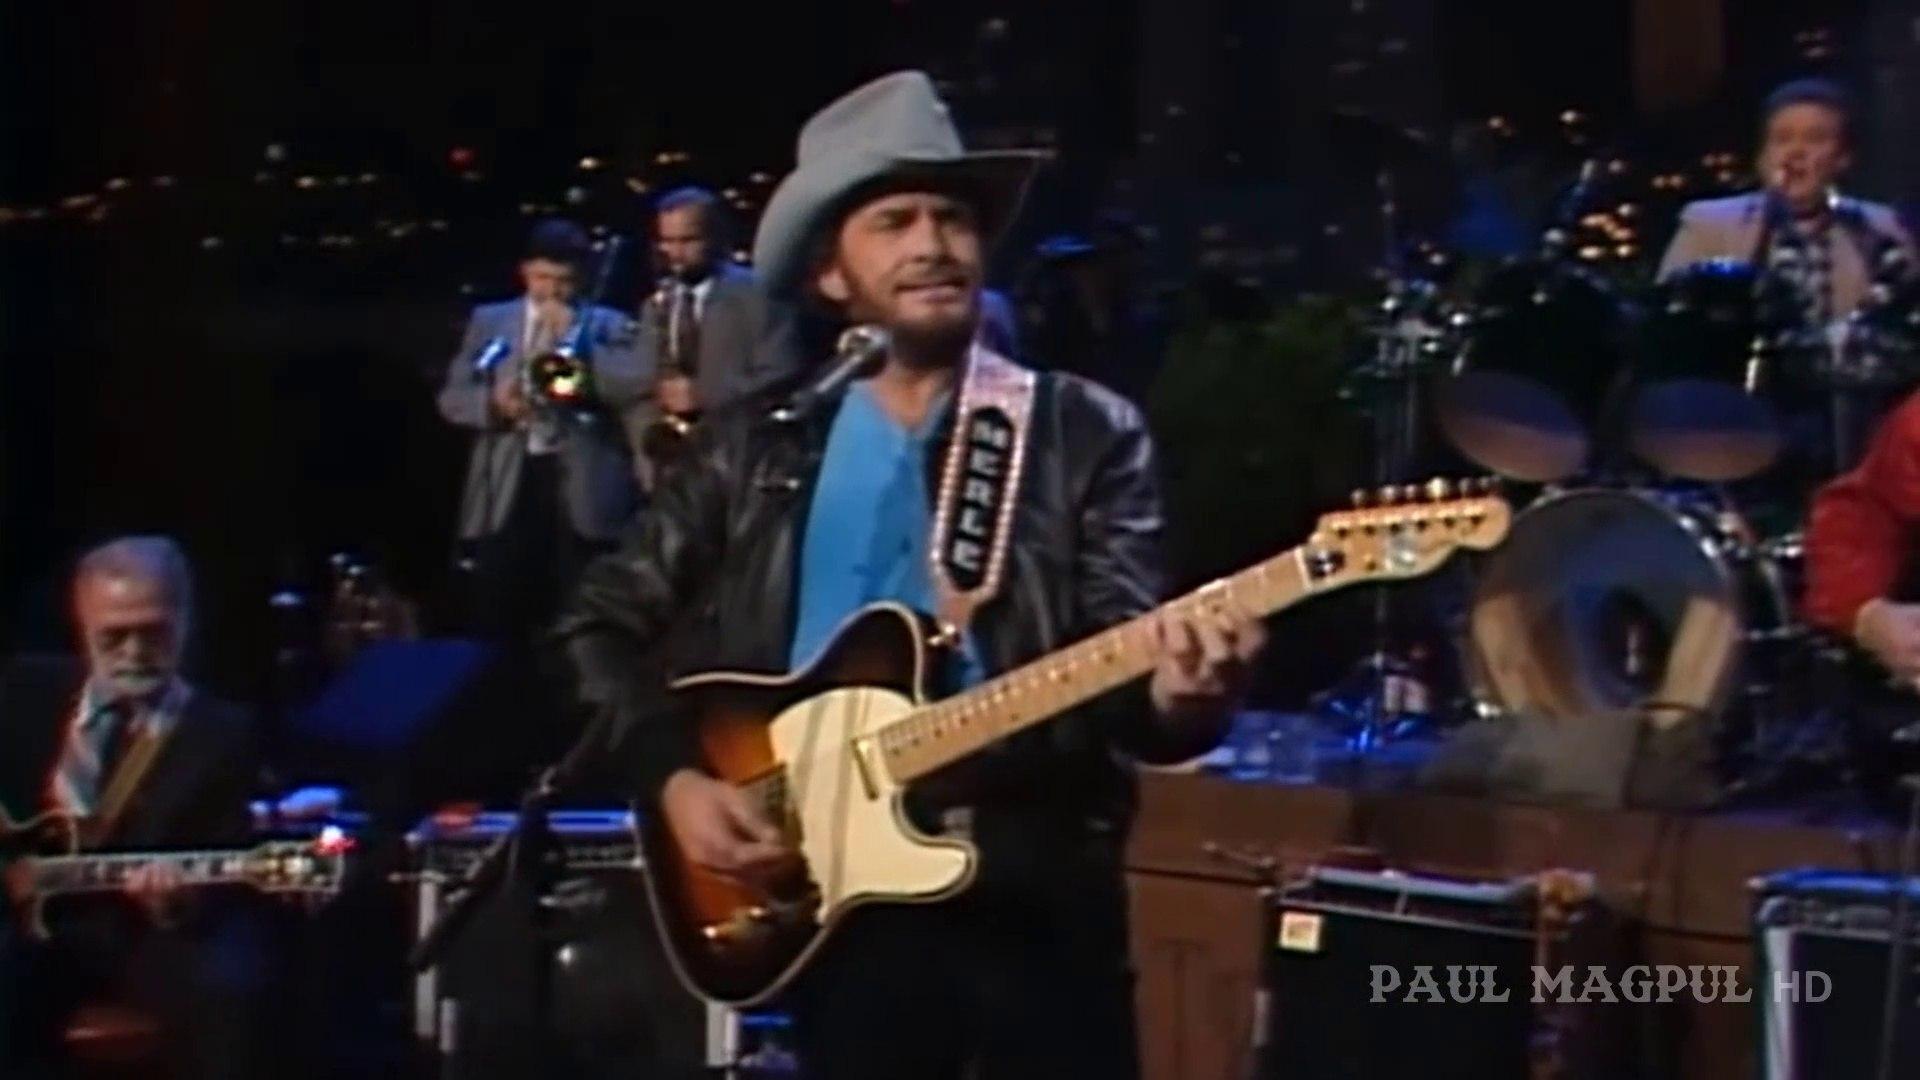 Merle Haggard (HD) - Greatest Hits (1966-1989) - Part 2/2